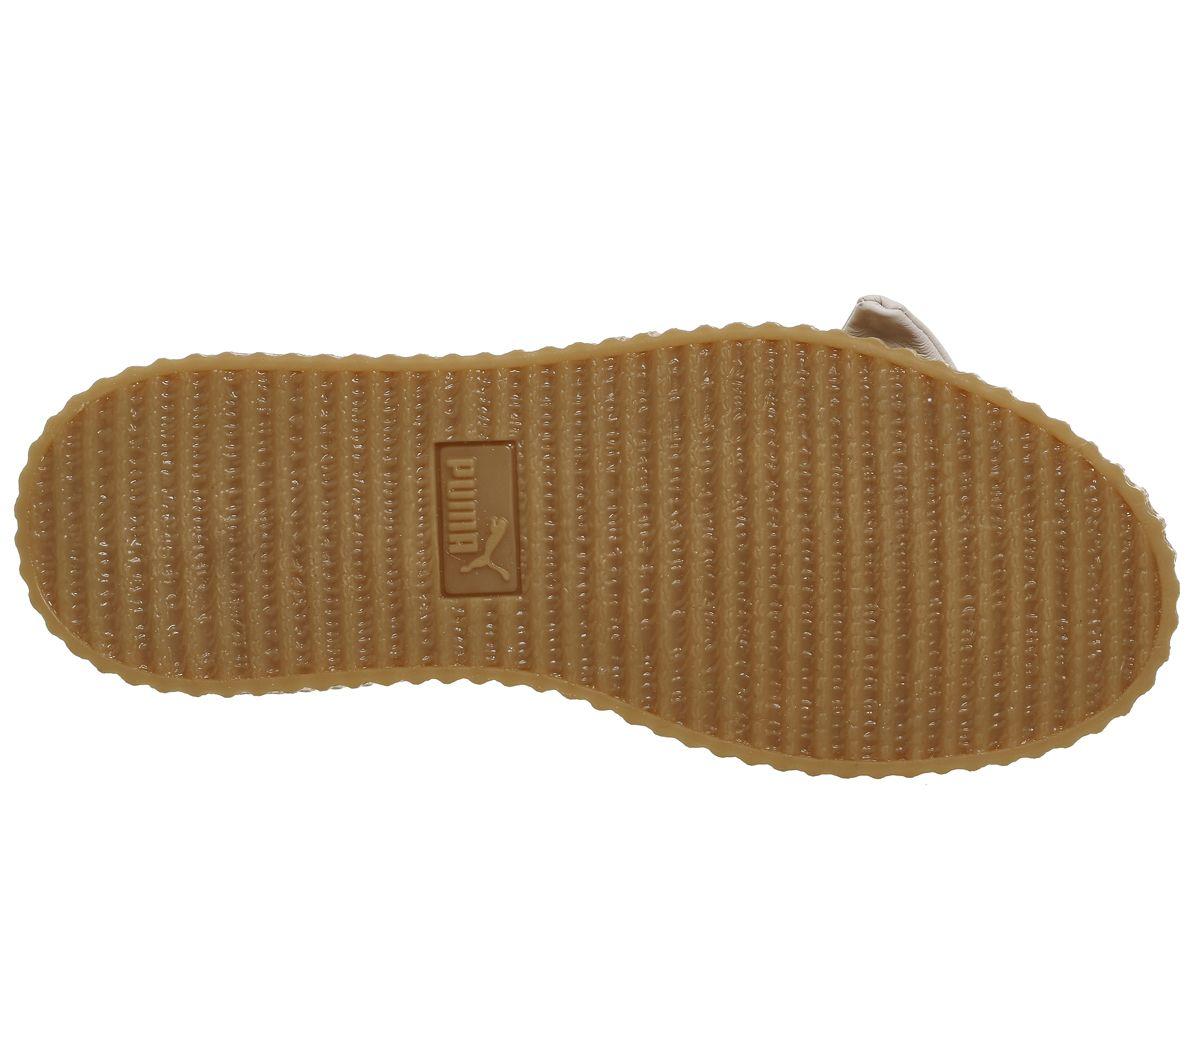 073a9447643 Chaussures-Femme-Puma-Creeper-Ballet-Dentelle-Creme-Fenty-